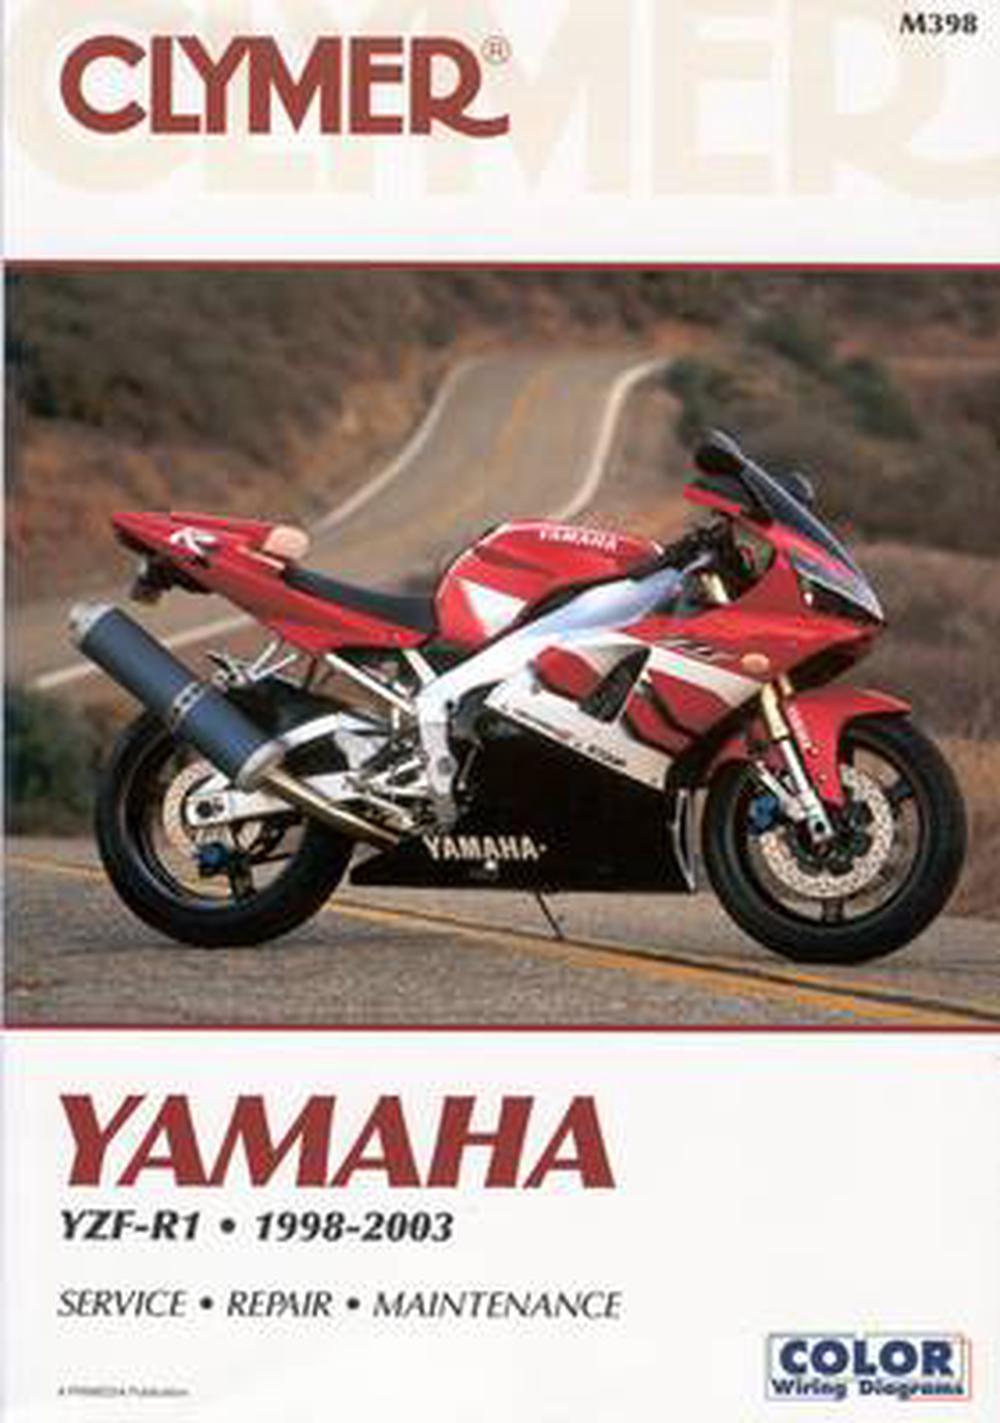 medium resolution of clymer yamaha yzf r1 1998 2003